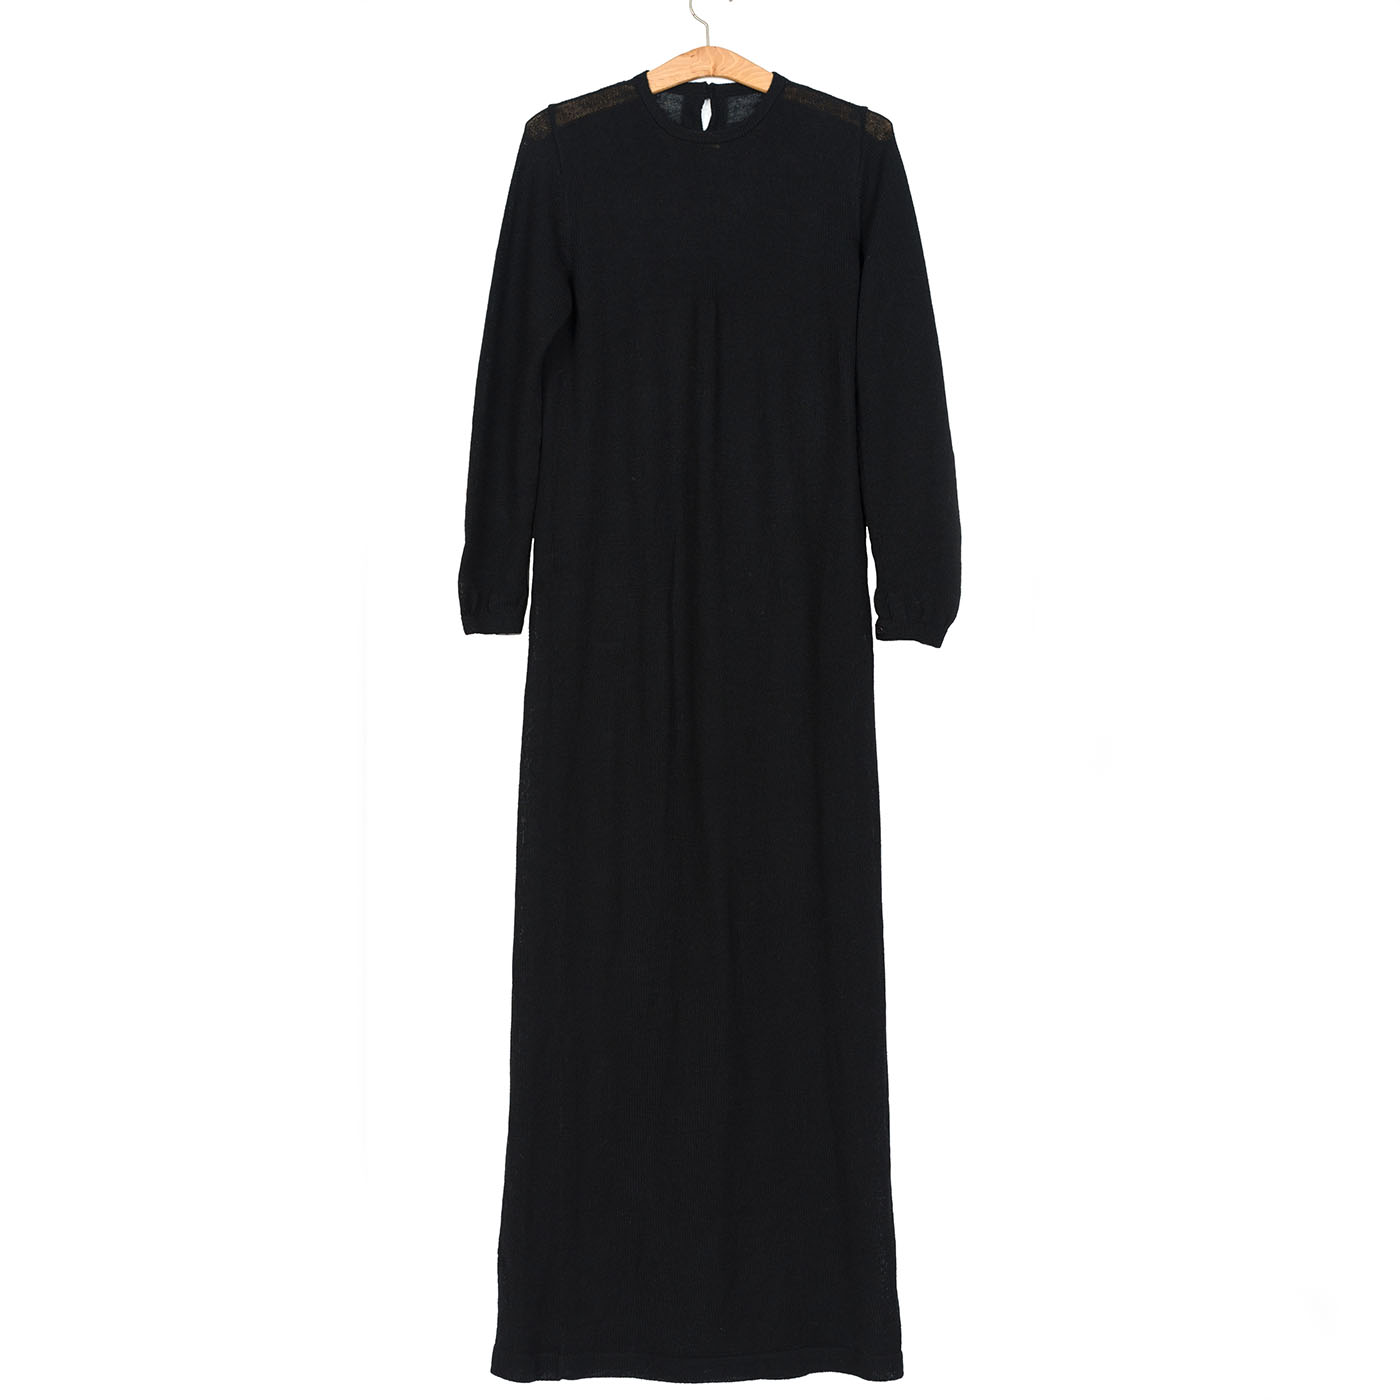 b5b5cb15740 Vestido Largo – Long Alpaca Wool Dress. Black « chaleca.com